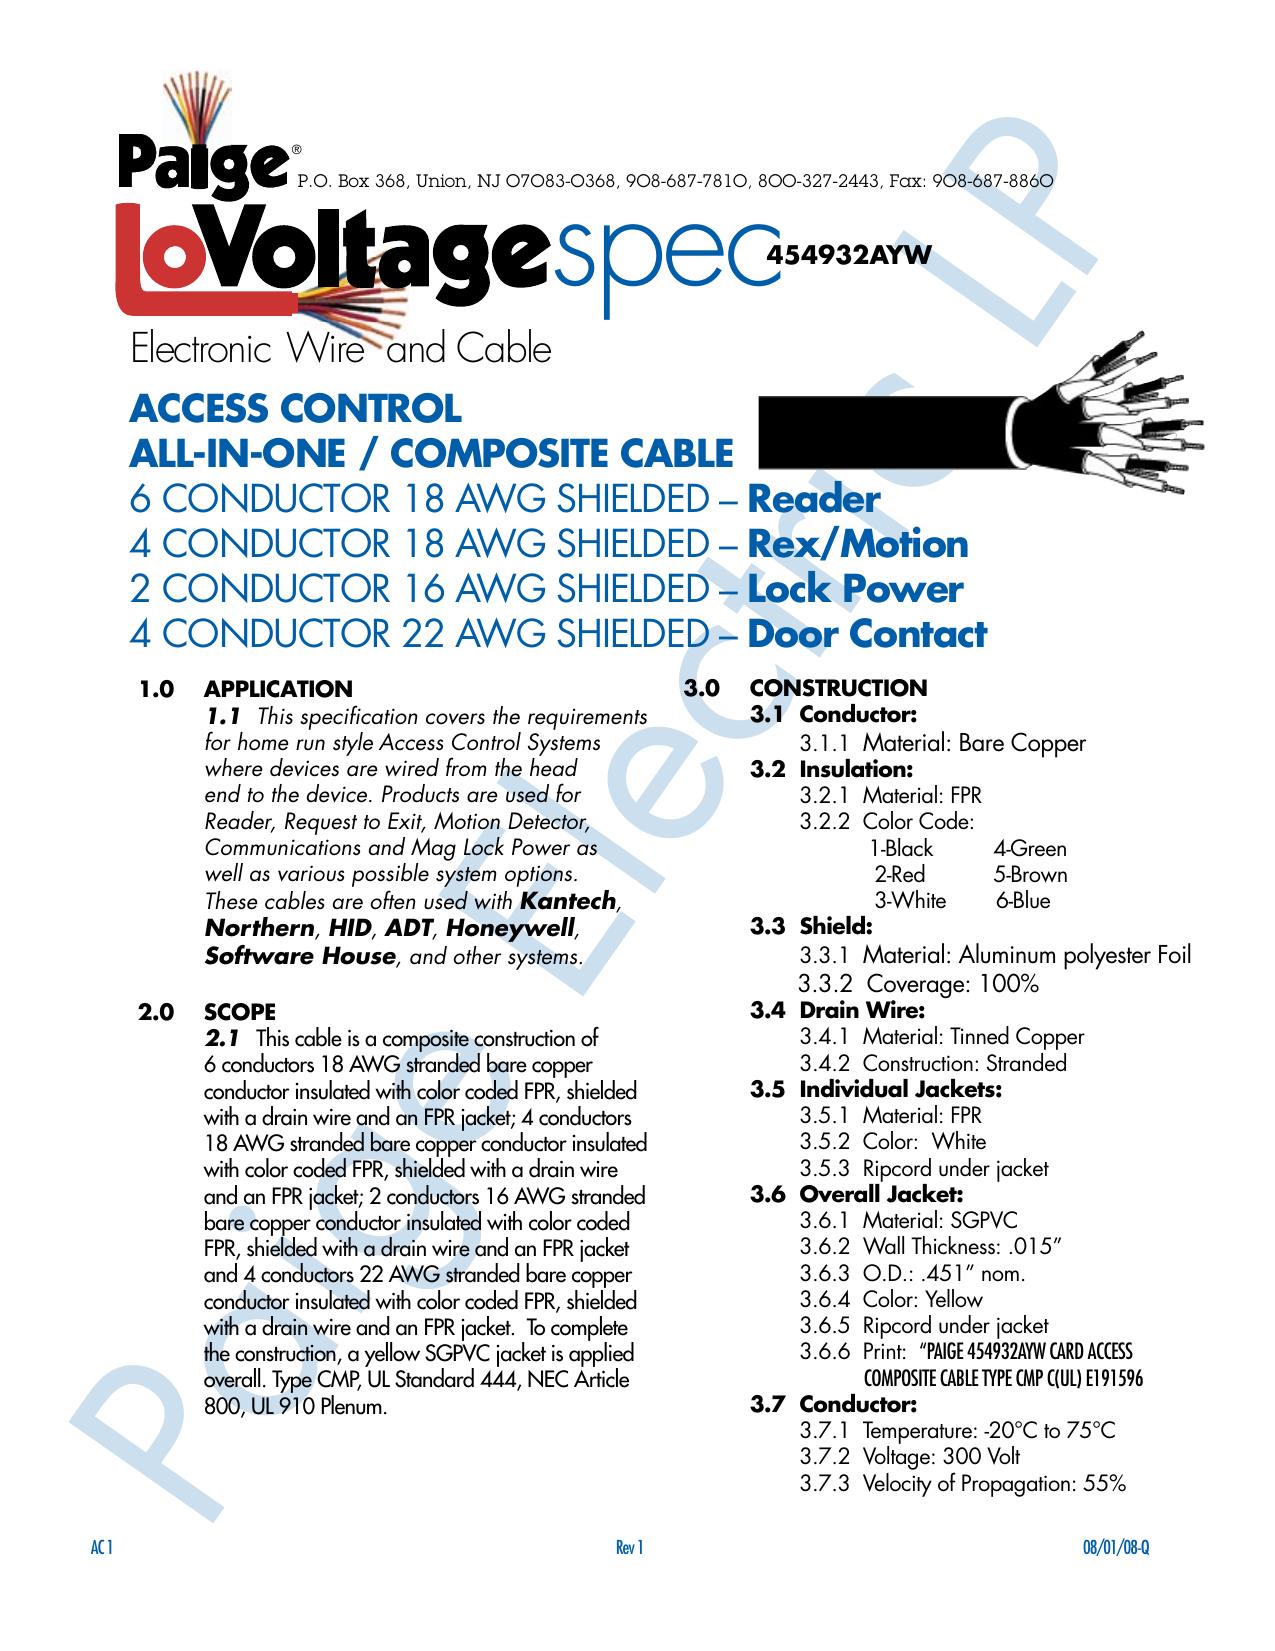 Wiring Mitsubishi Diagram Distributor 1998eclips Electrical John Deere 4500 Fuse Box Vertex Detailed Schematic Diagrams Amazing